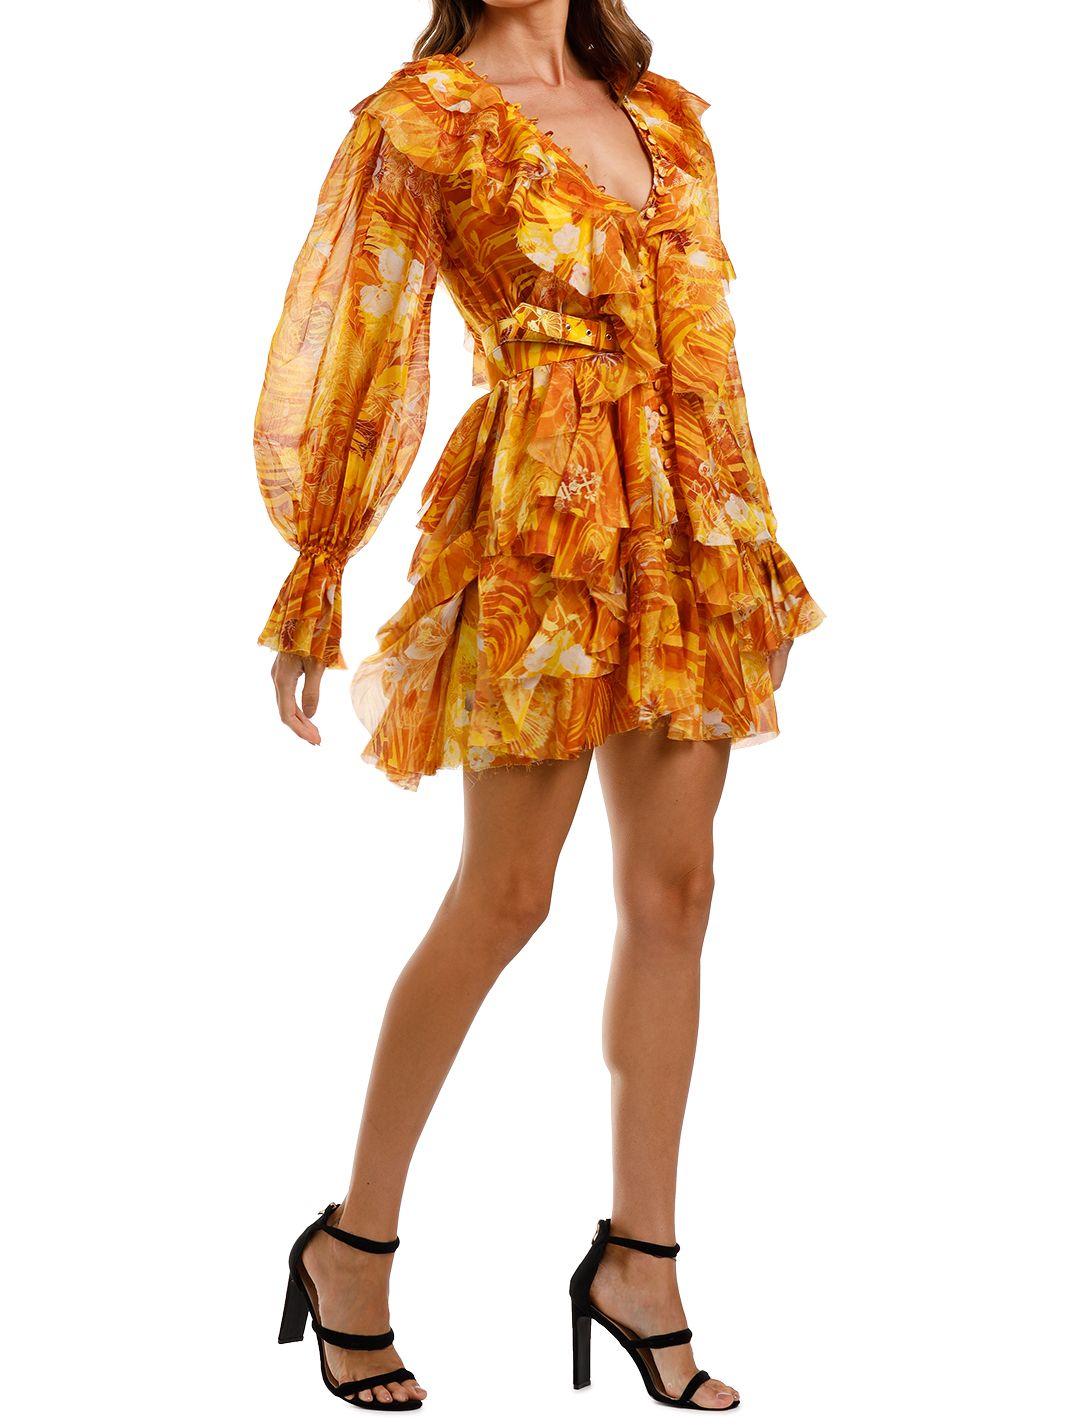 LEO & LIN The Kiss Ruffle Dress Yellow mini v neck